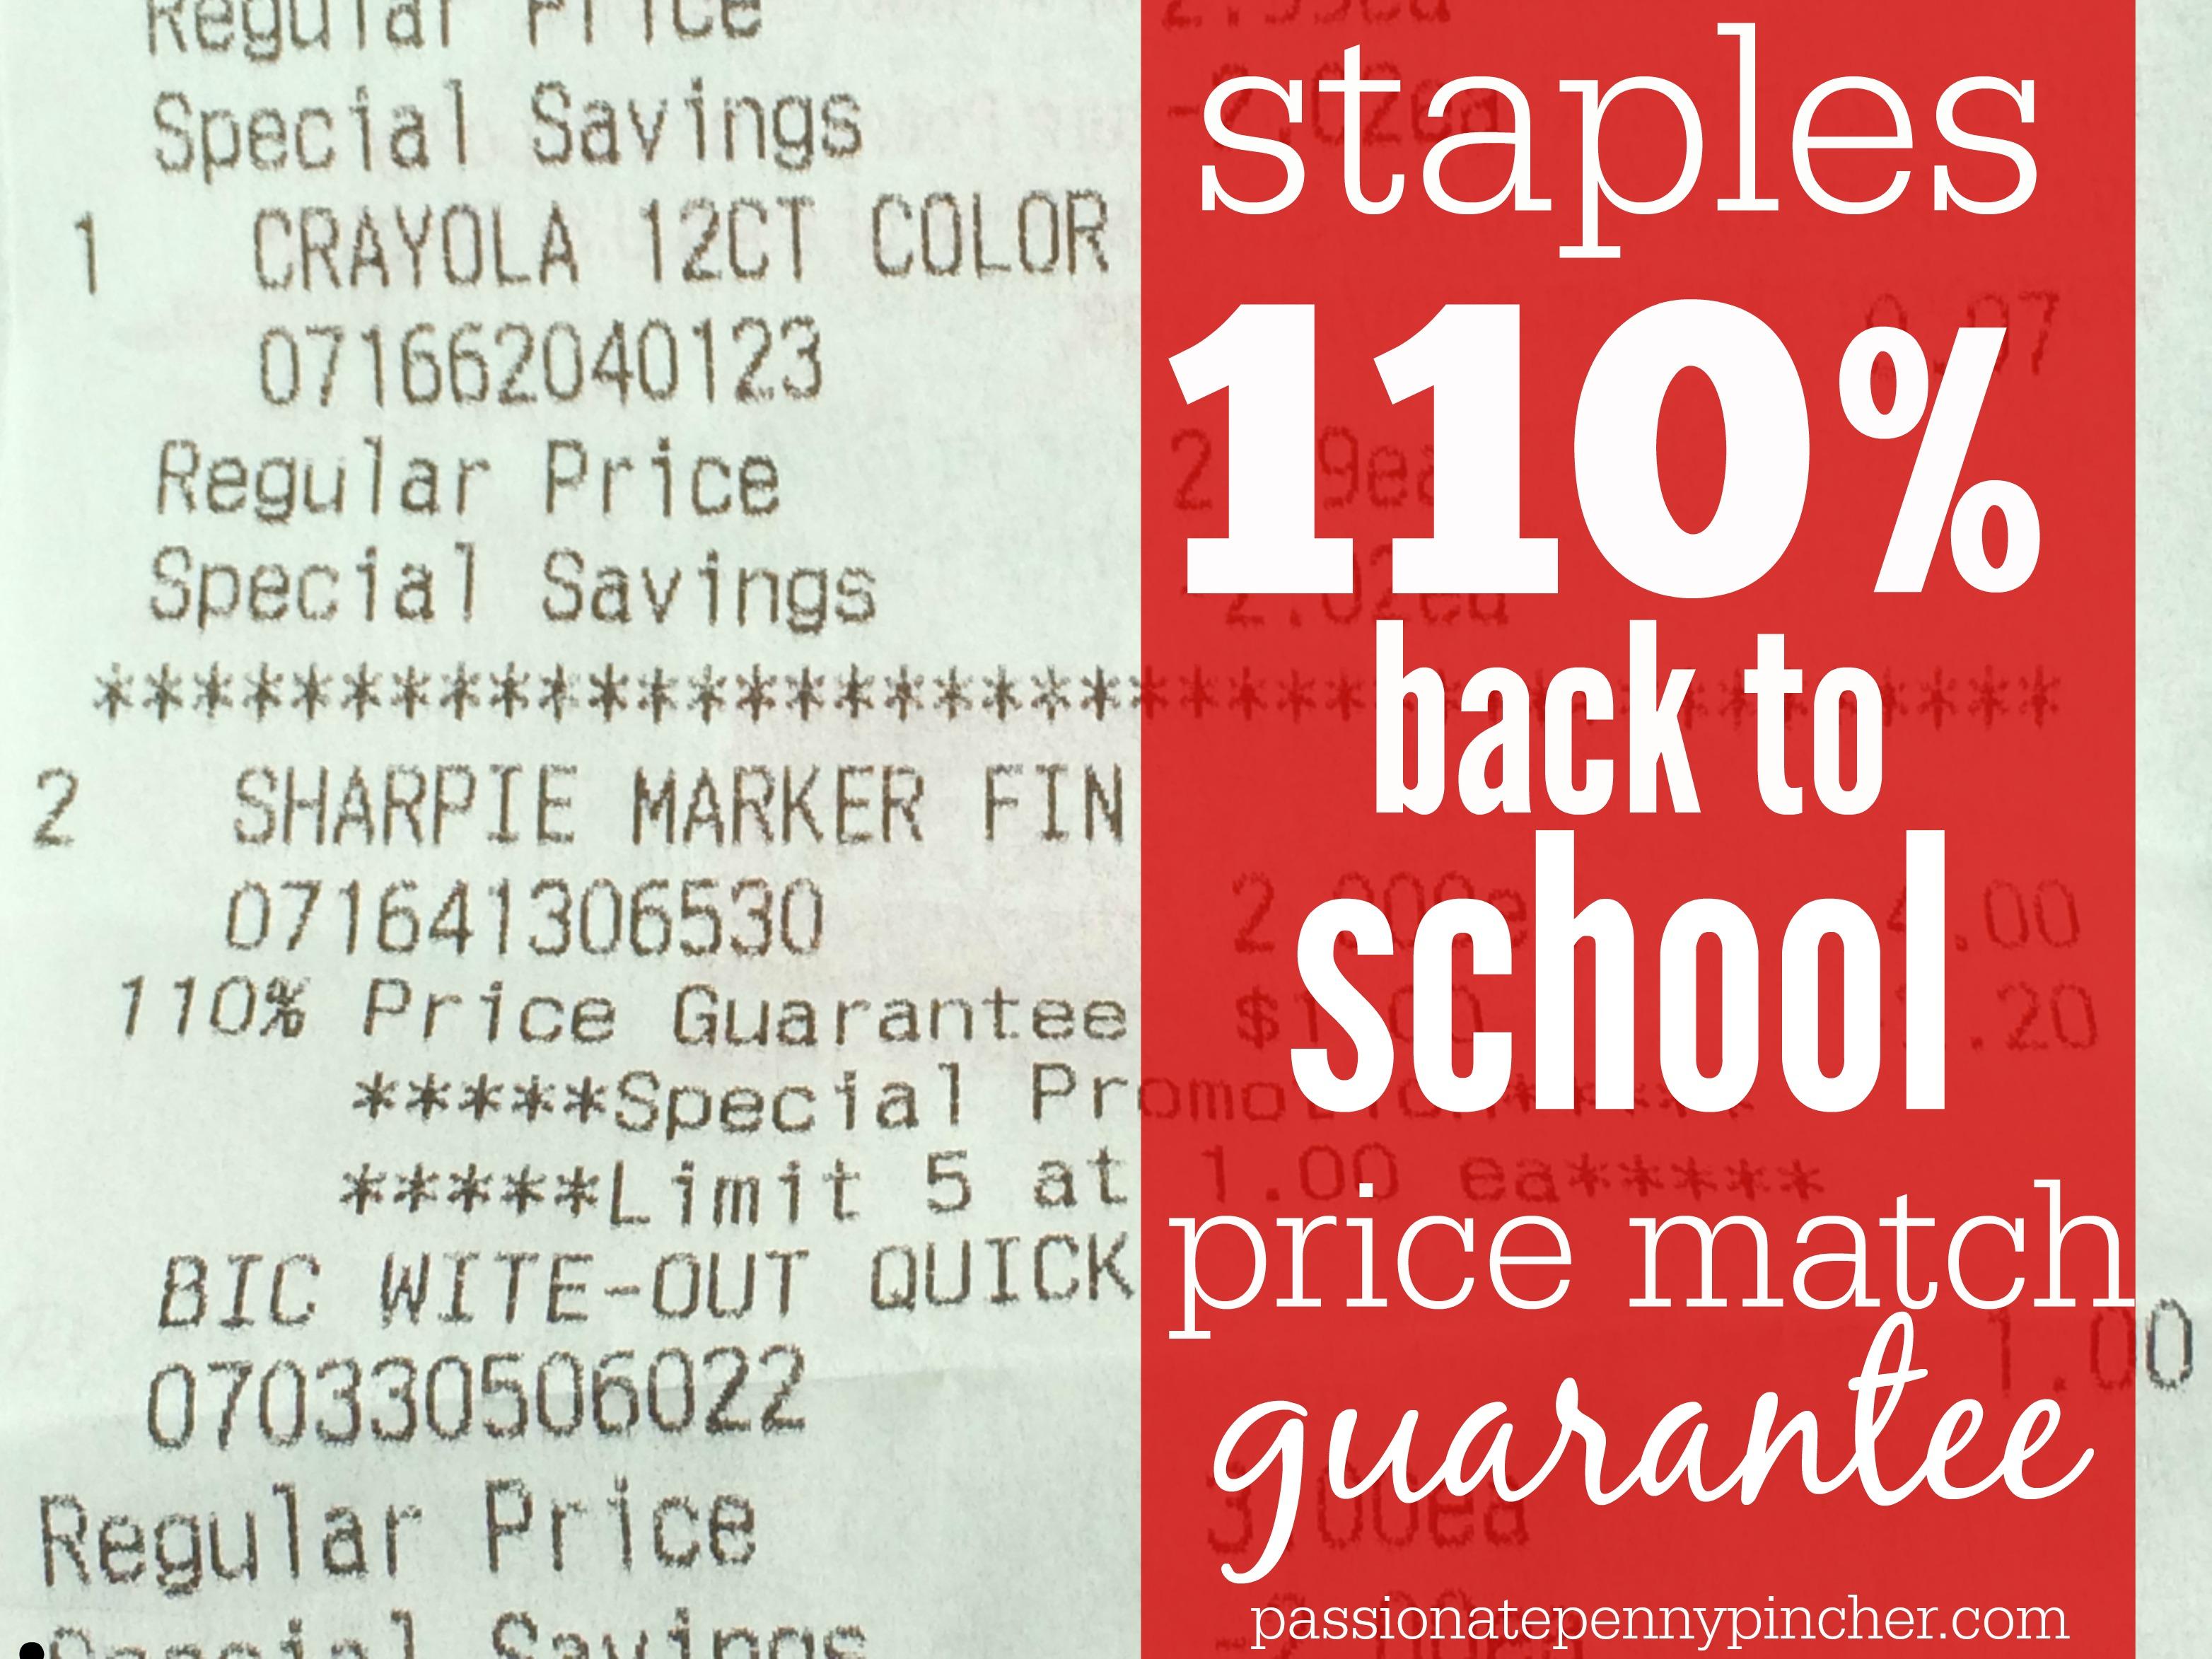 staples 110 price match guarantee